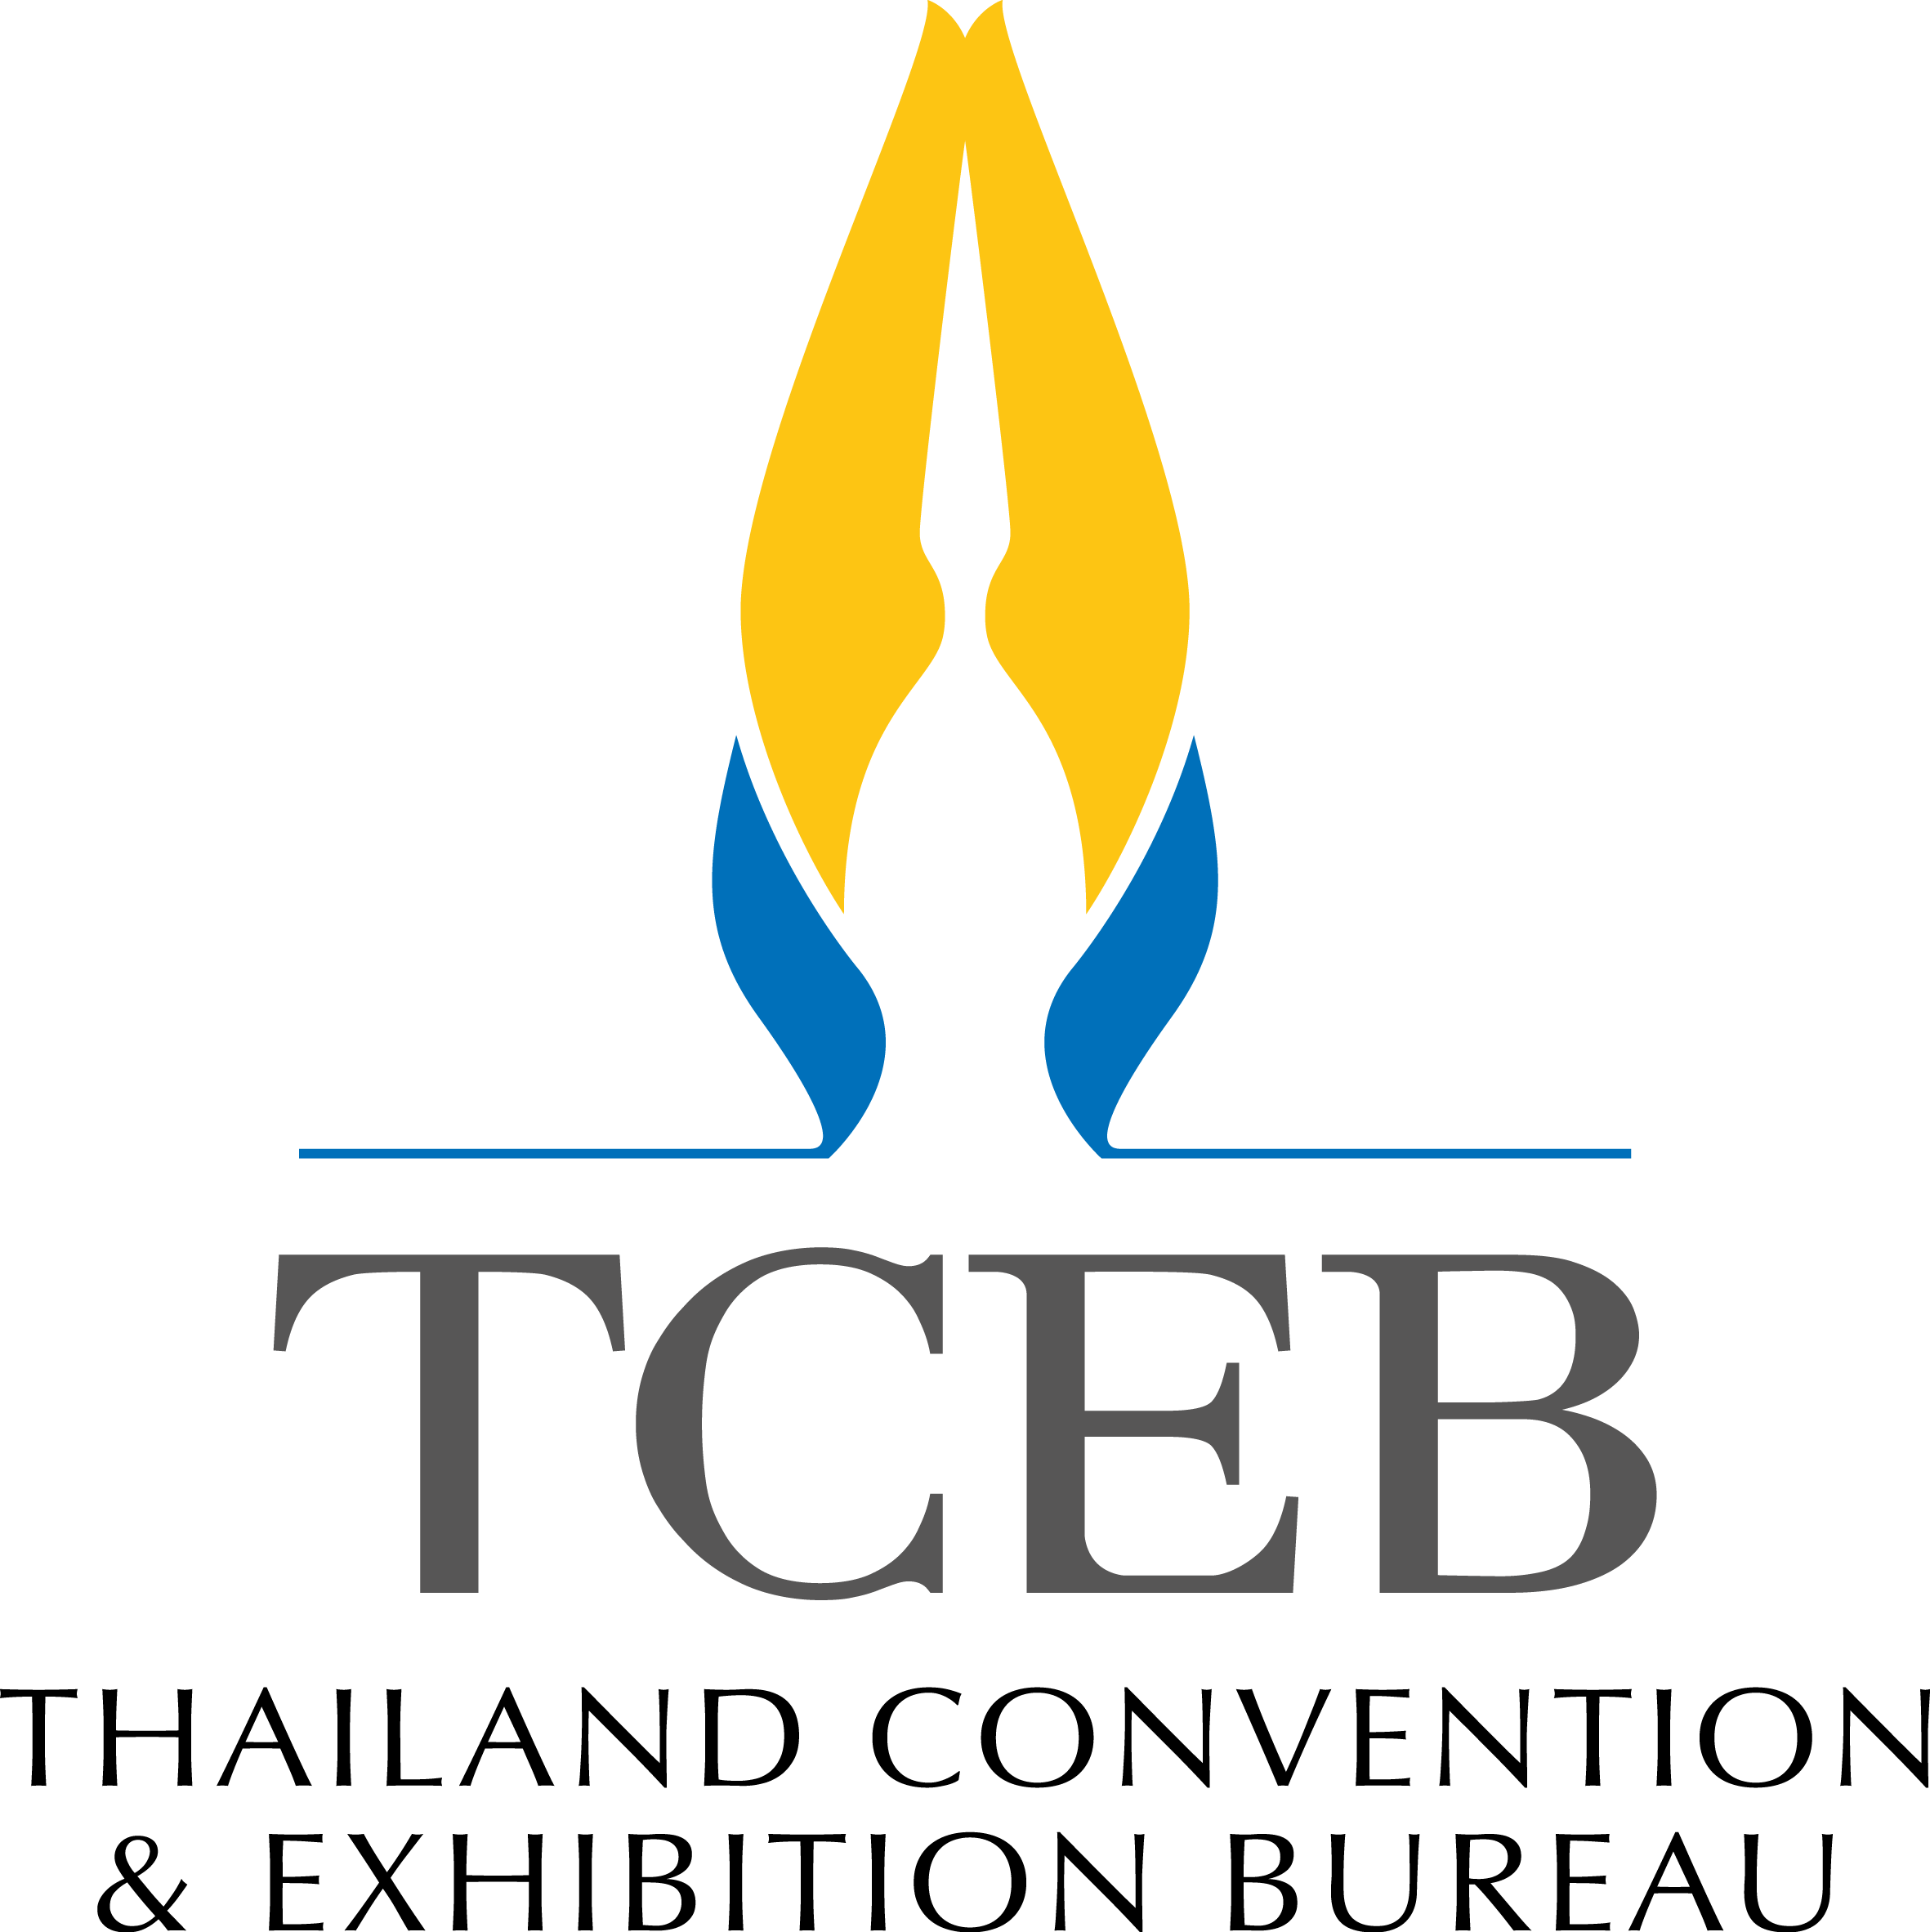 TCEB_logo_ART_v.1.0